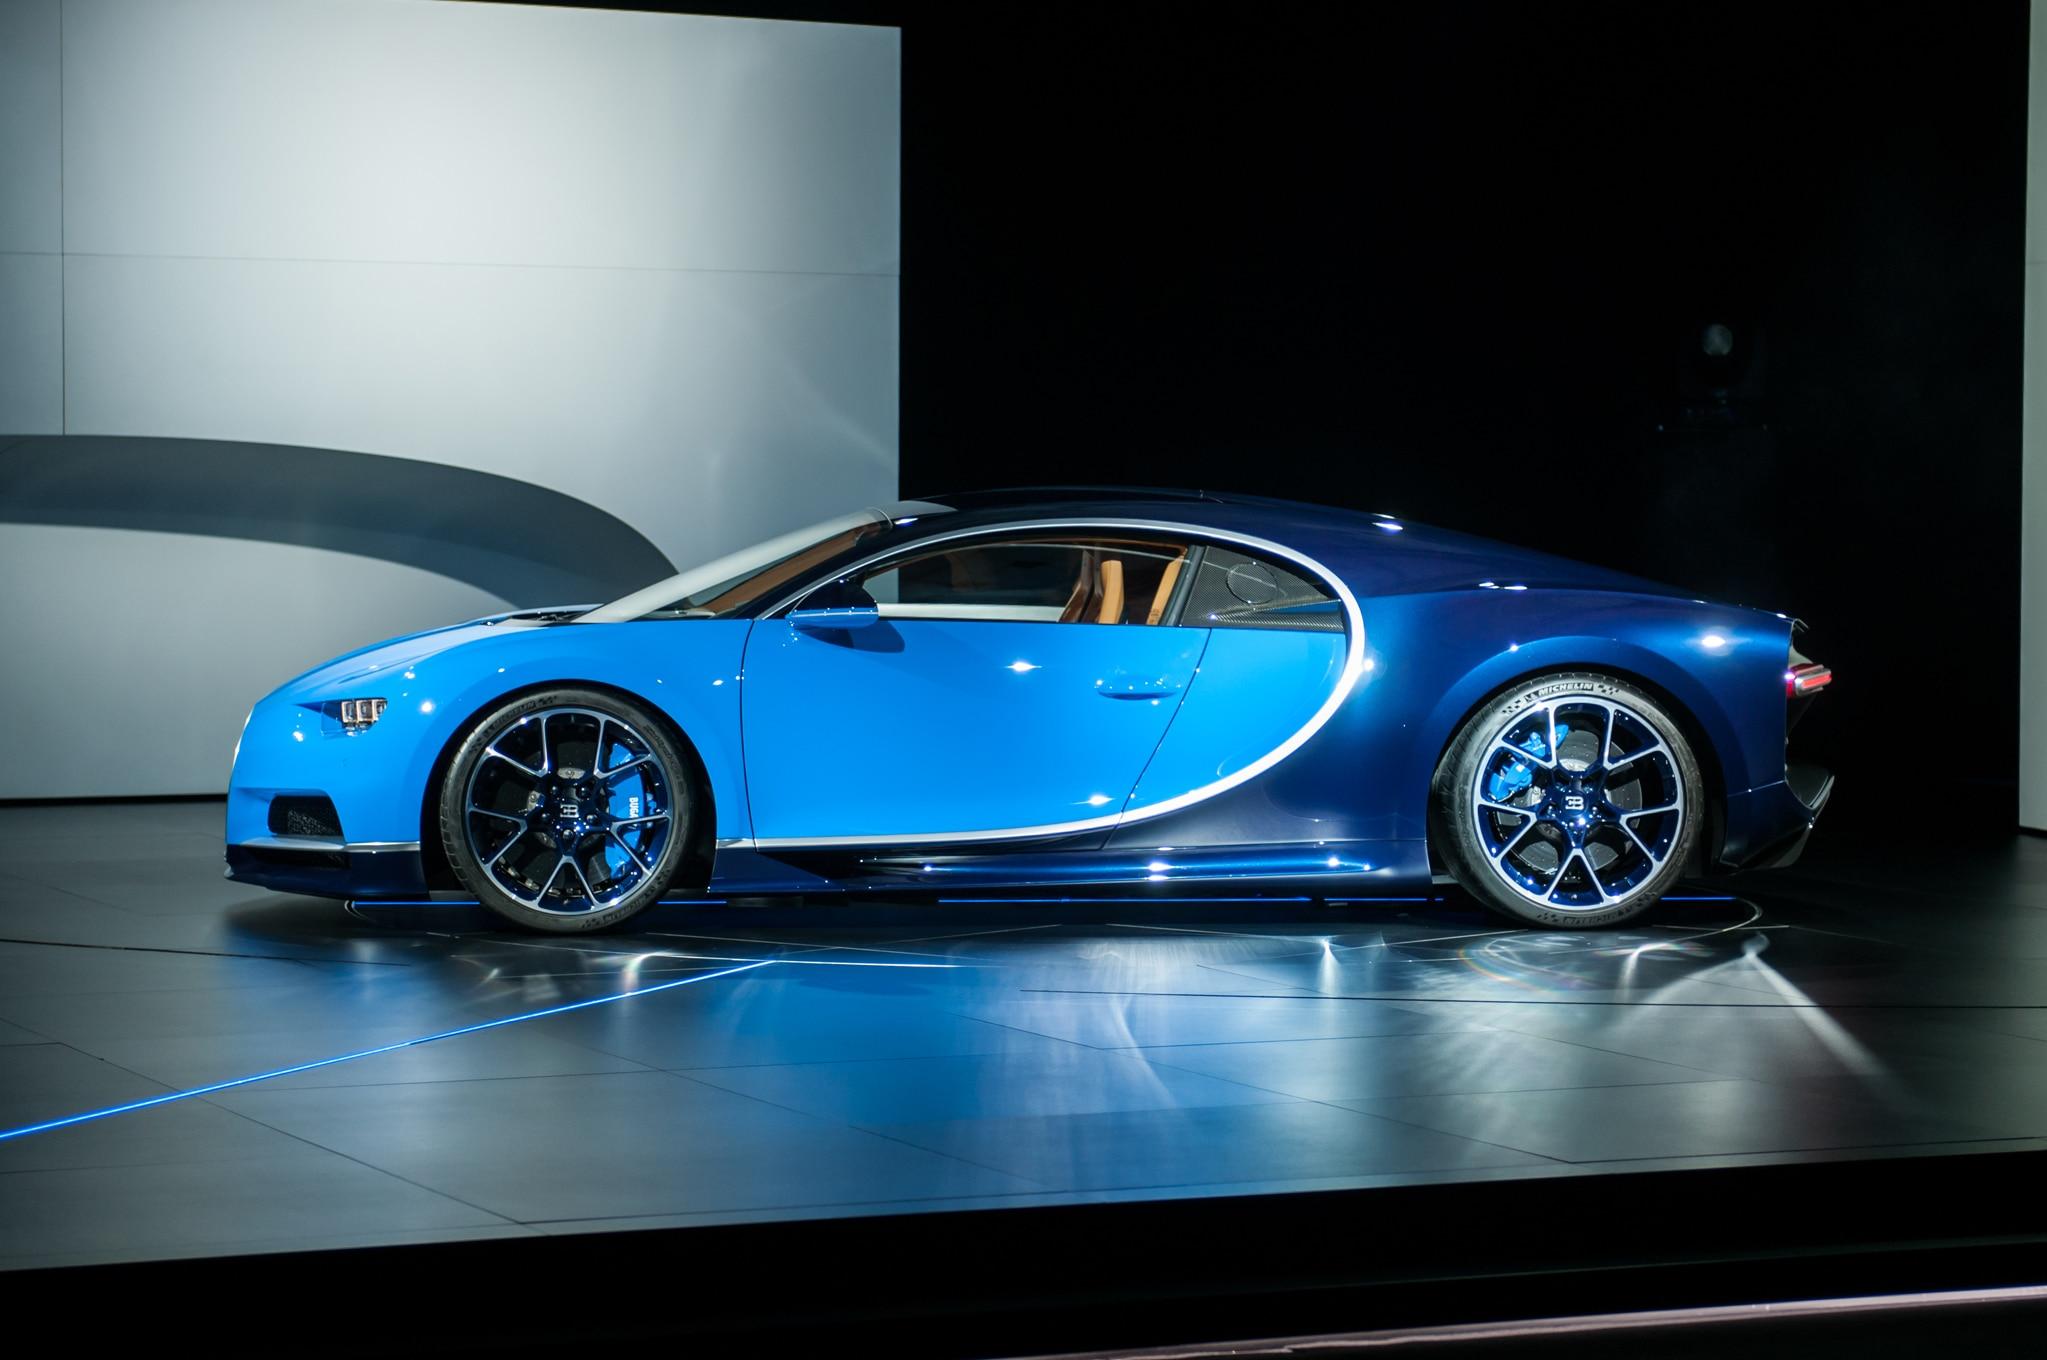 Bugatti Chiron Is a 1,500-HP, 280-MPH, Physics-Defying Masterpiece on ariel atom rear, 1967 camaro rear, srt viper rear, 1970 camaro rear, veyron rear, 2014 camaro rear, mustang rear, volkswagen rear, 1968 camaro rear, hennessey venom gt rear, aston martin rear, ac cobra rear, koenigsegg rear, aventador rear,